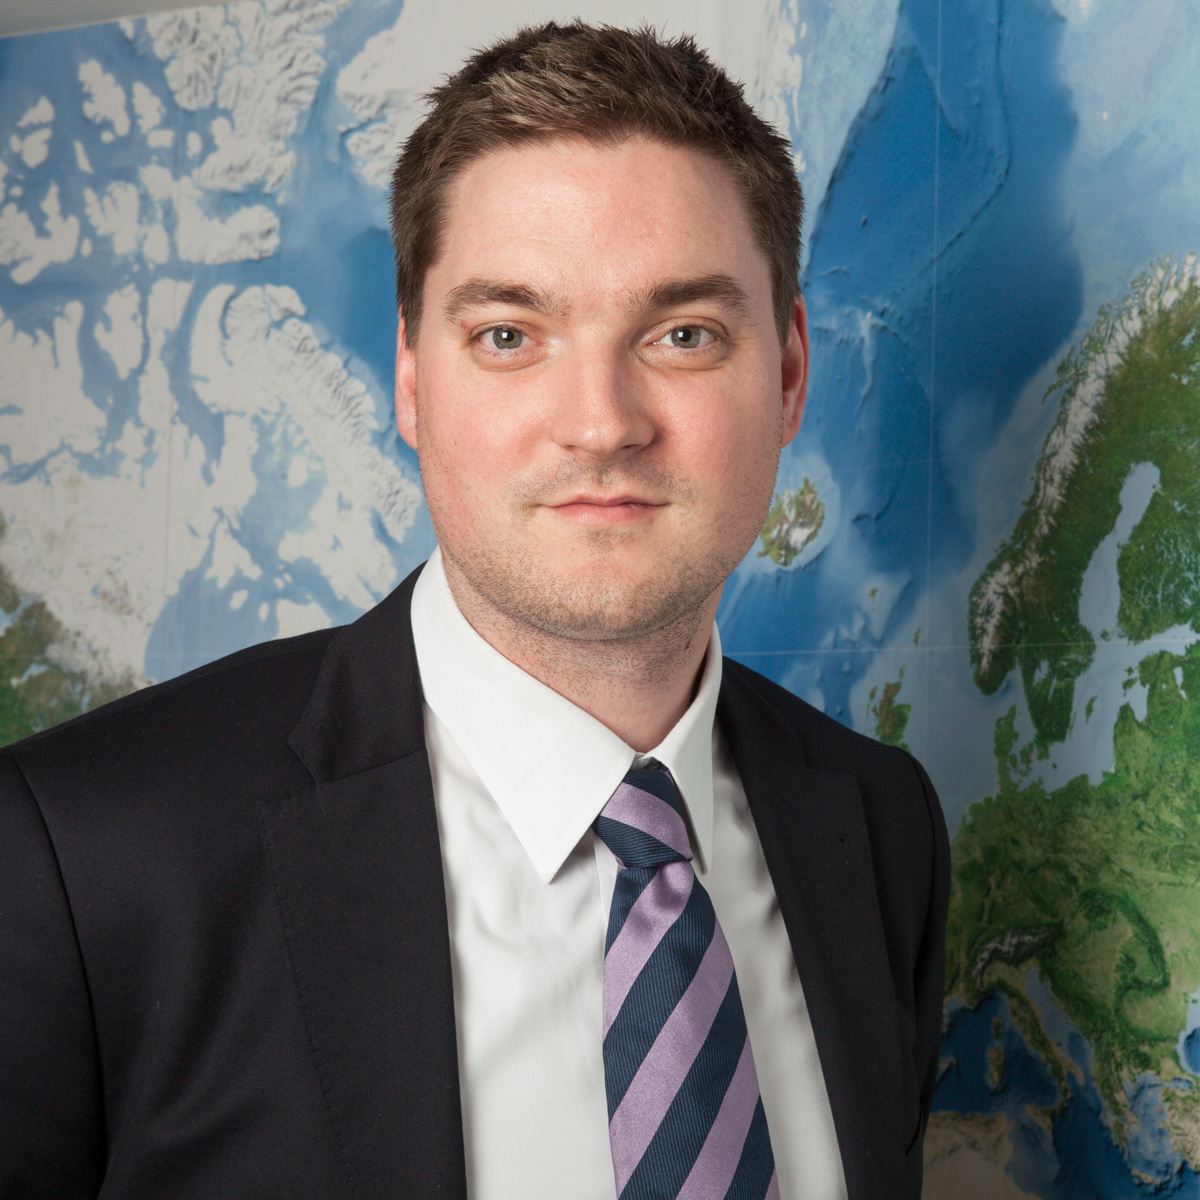 James Wood of International SOS